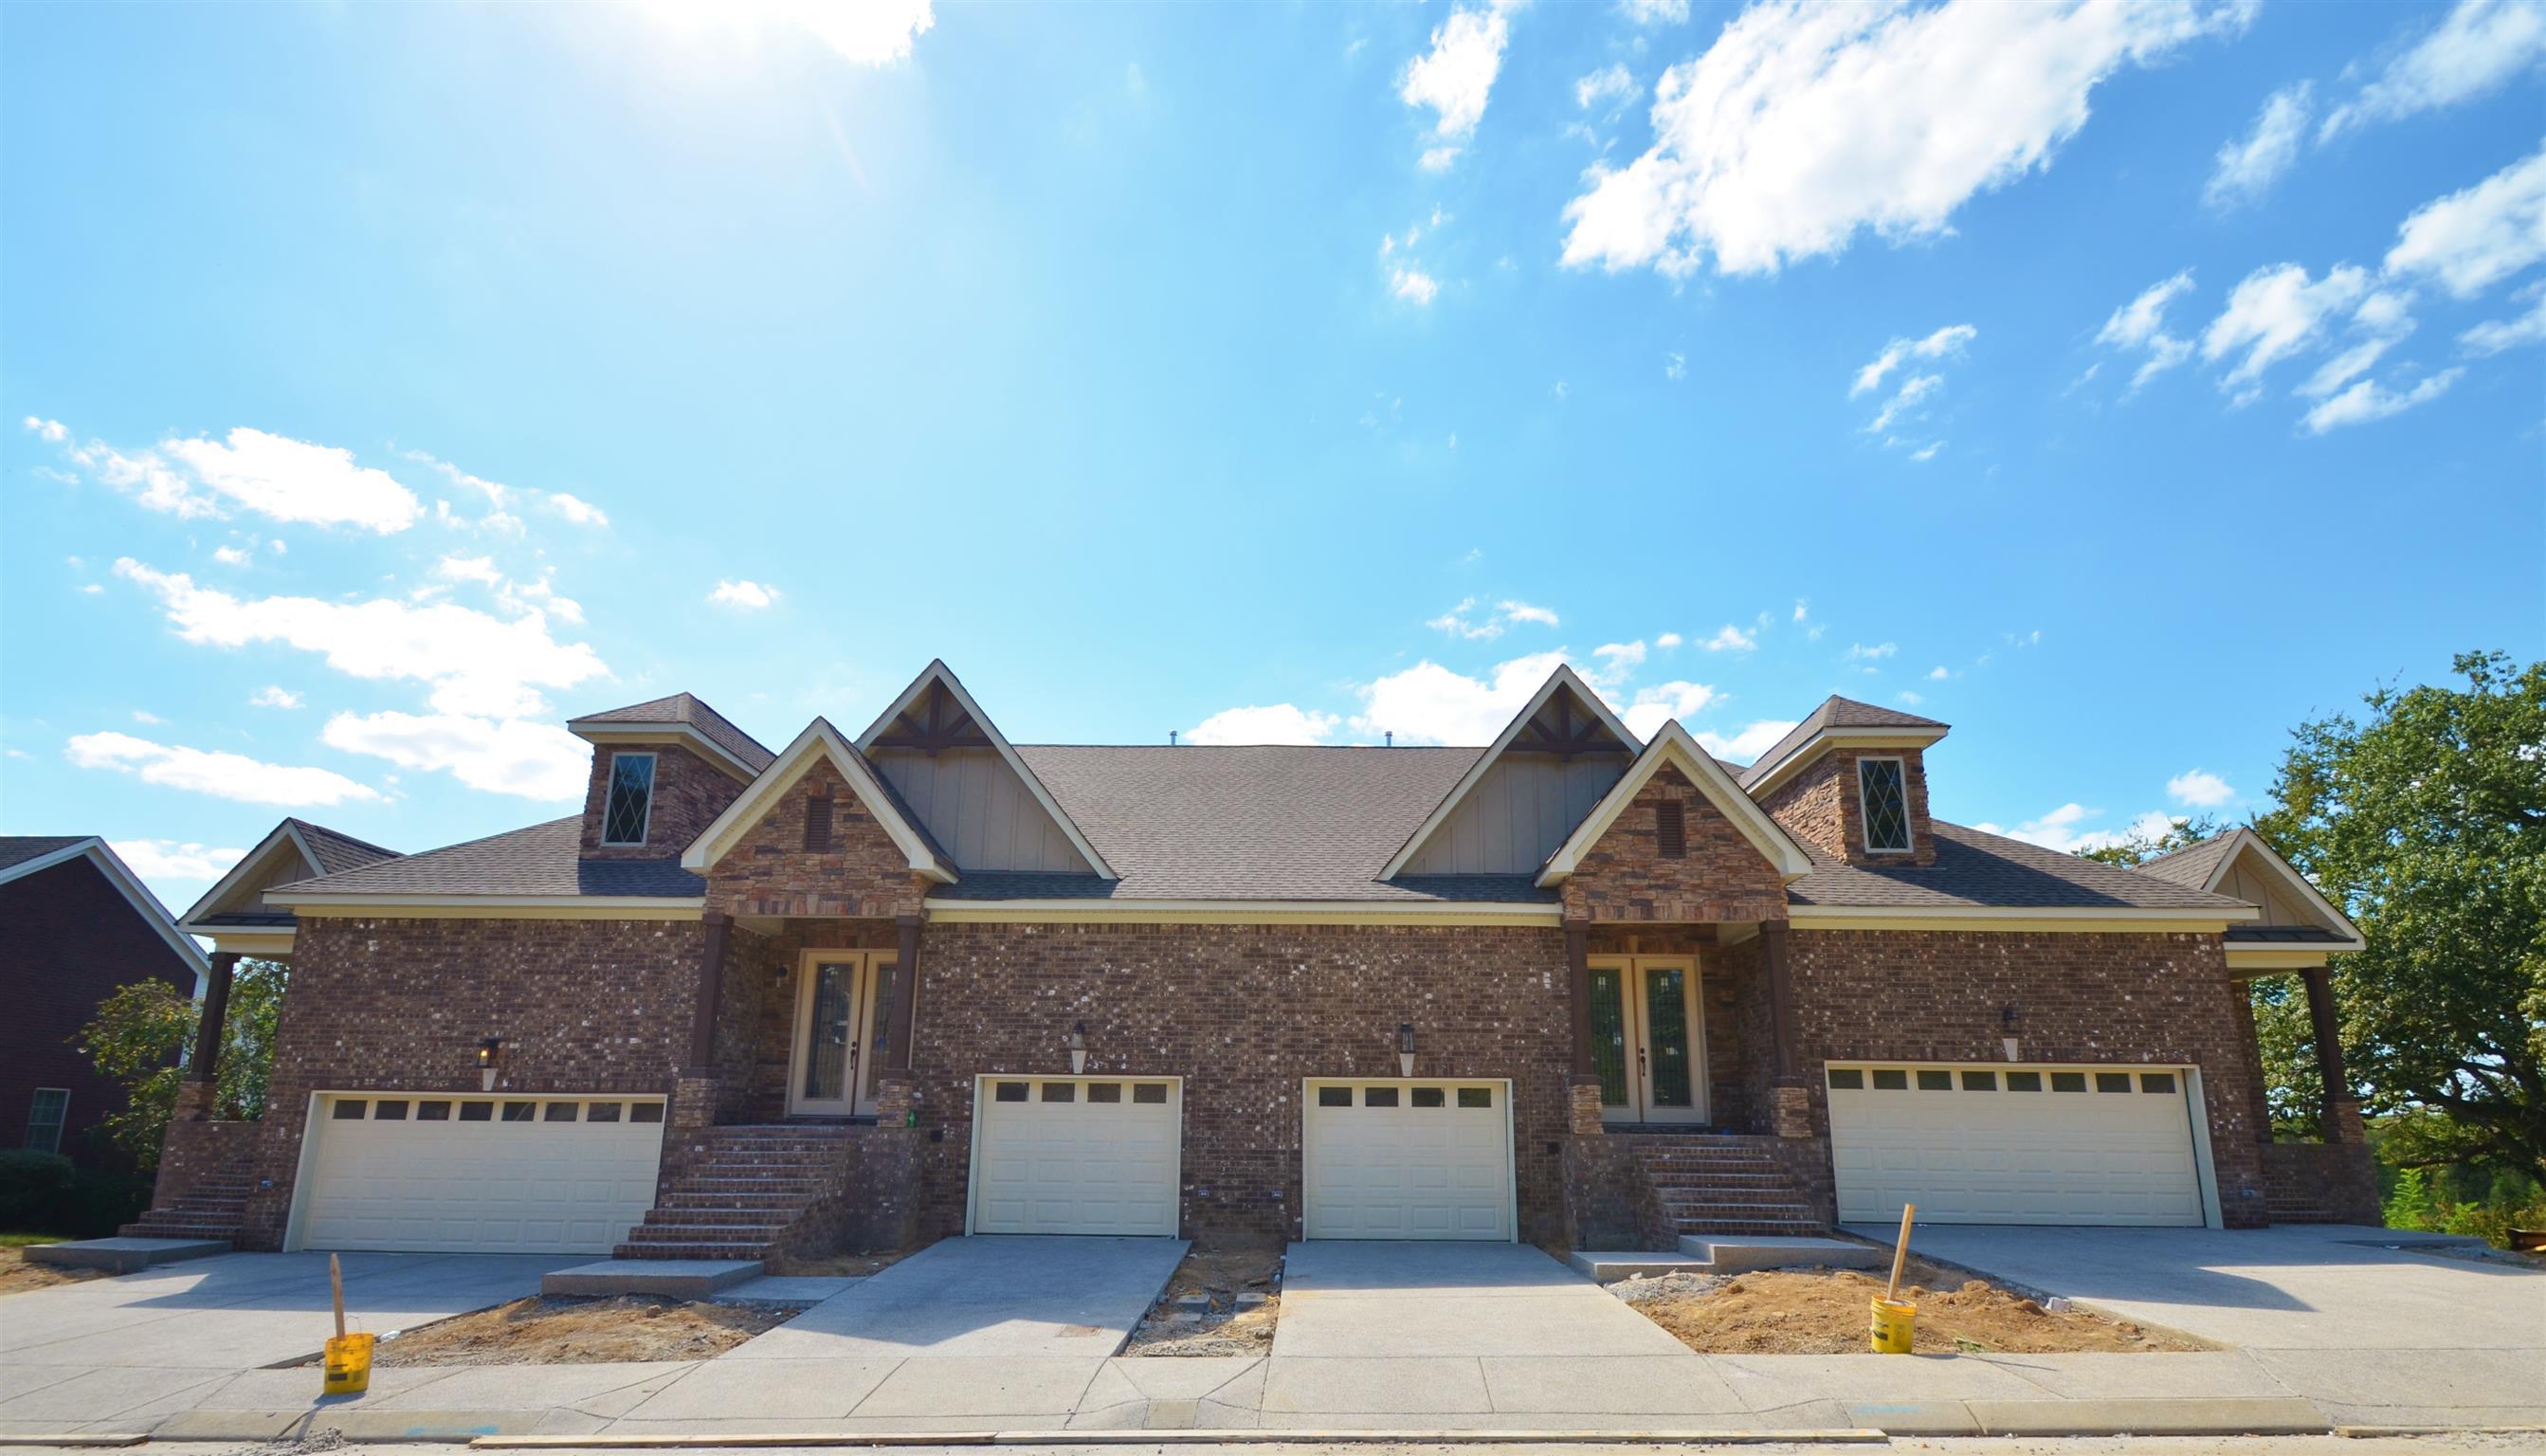 5002 Southfork Blvd #22, Old Hickory, TN 37138 - Old Hickory, TN real estate listing